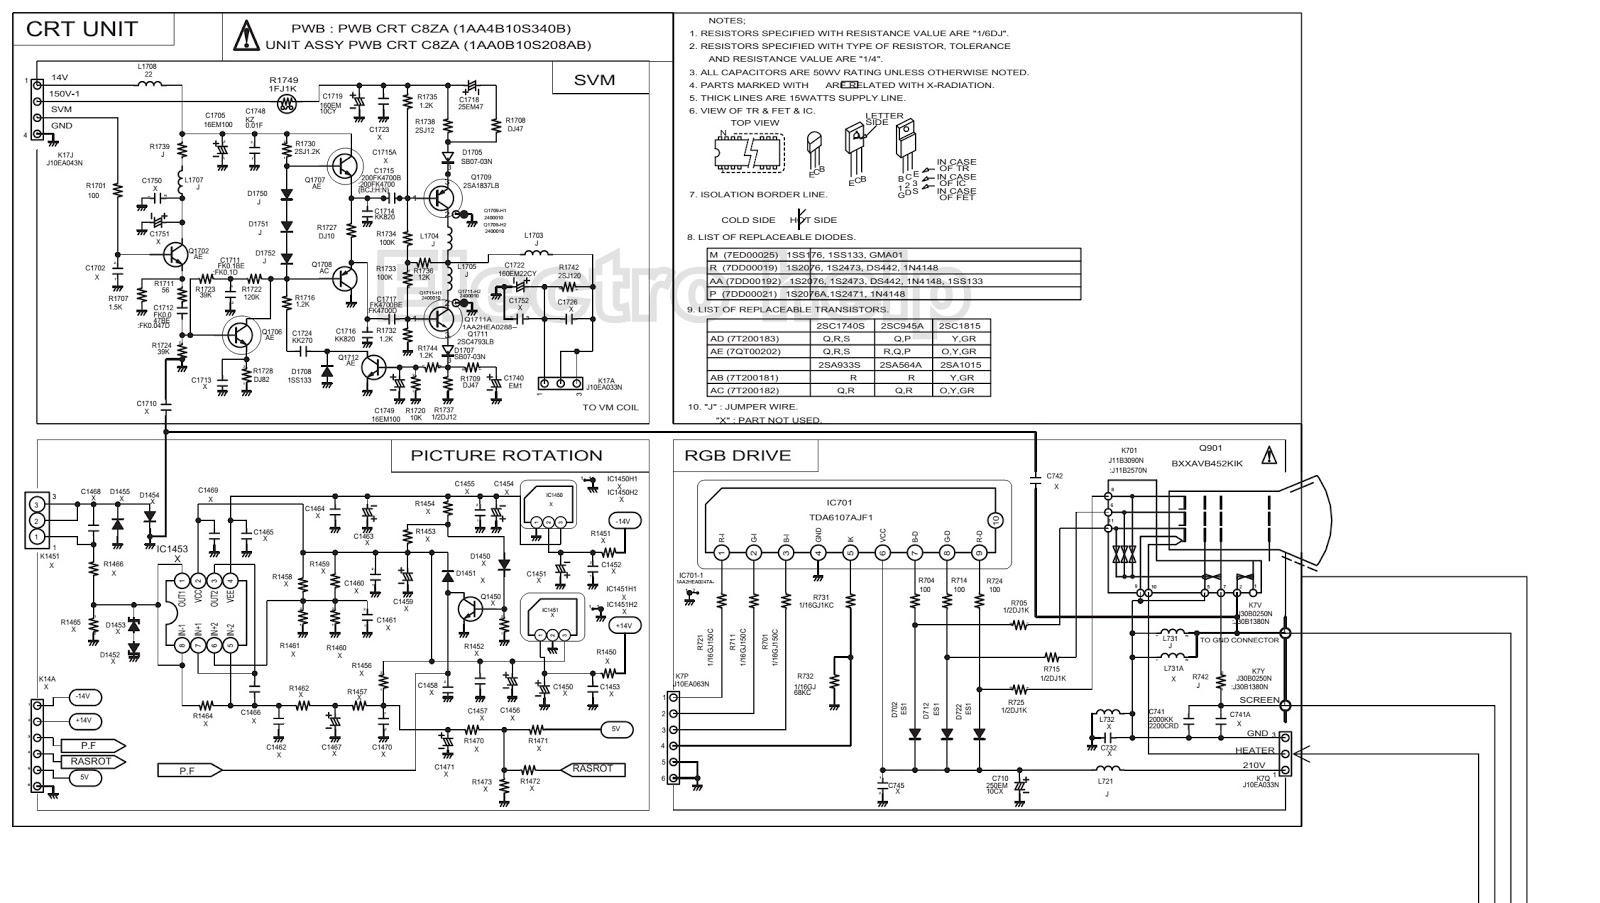 sanyo tv diagram blog wiring diagram sanyo tv circuit diagram sanyo tv diagram [ 1600 x 903 Pixel ]